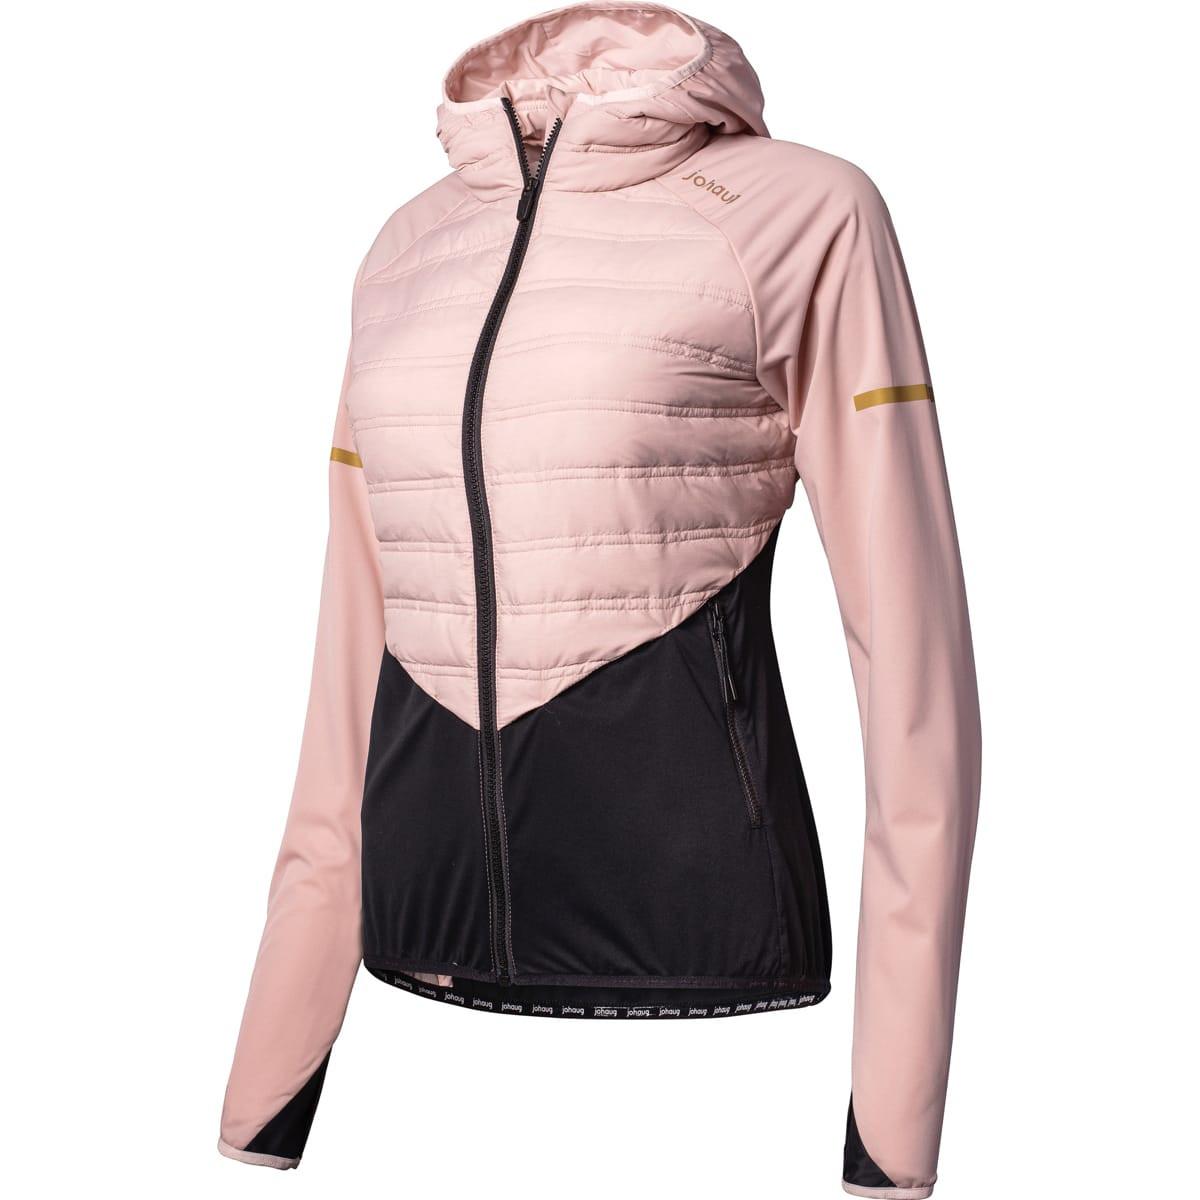 Johaug Concept Jakke | SportsDeal